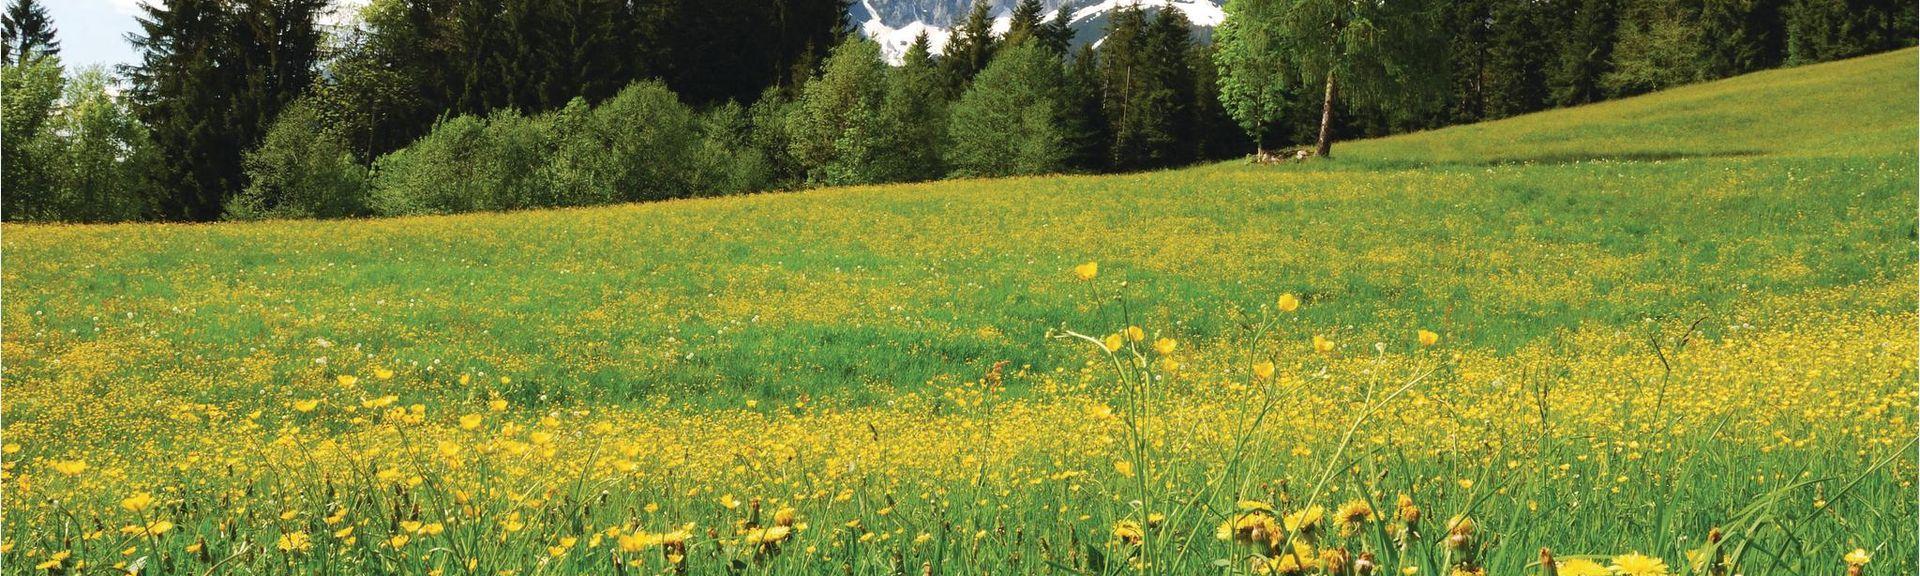 Stelli, Langwies, Switzerland